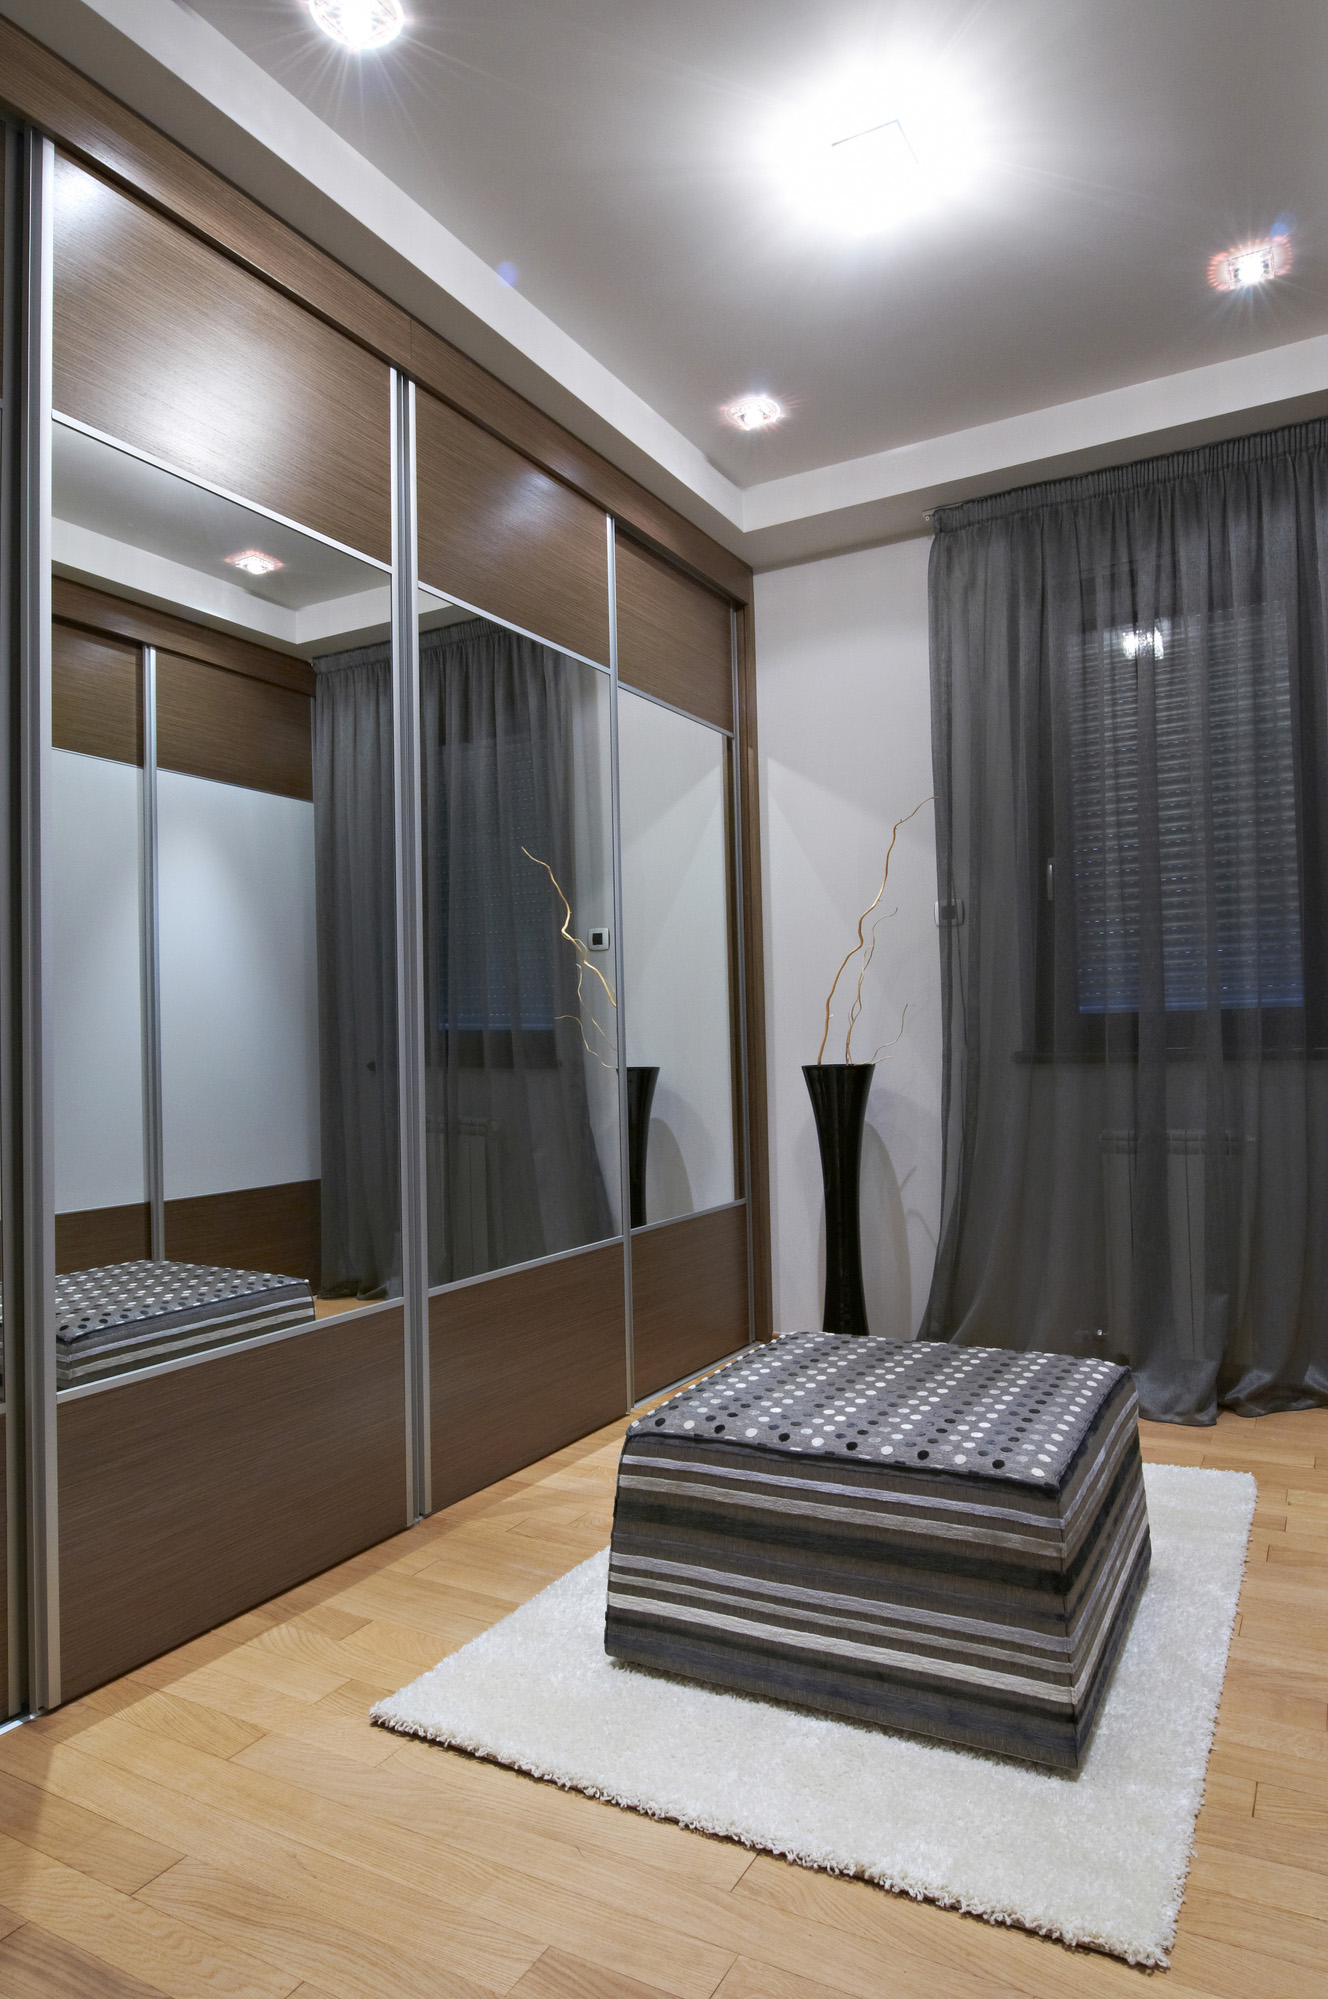 mirror wardrobe sliding door, bespoke fitted wardrobes, modern bedroom ideas